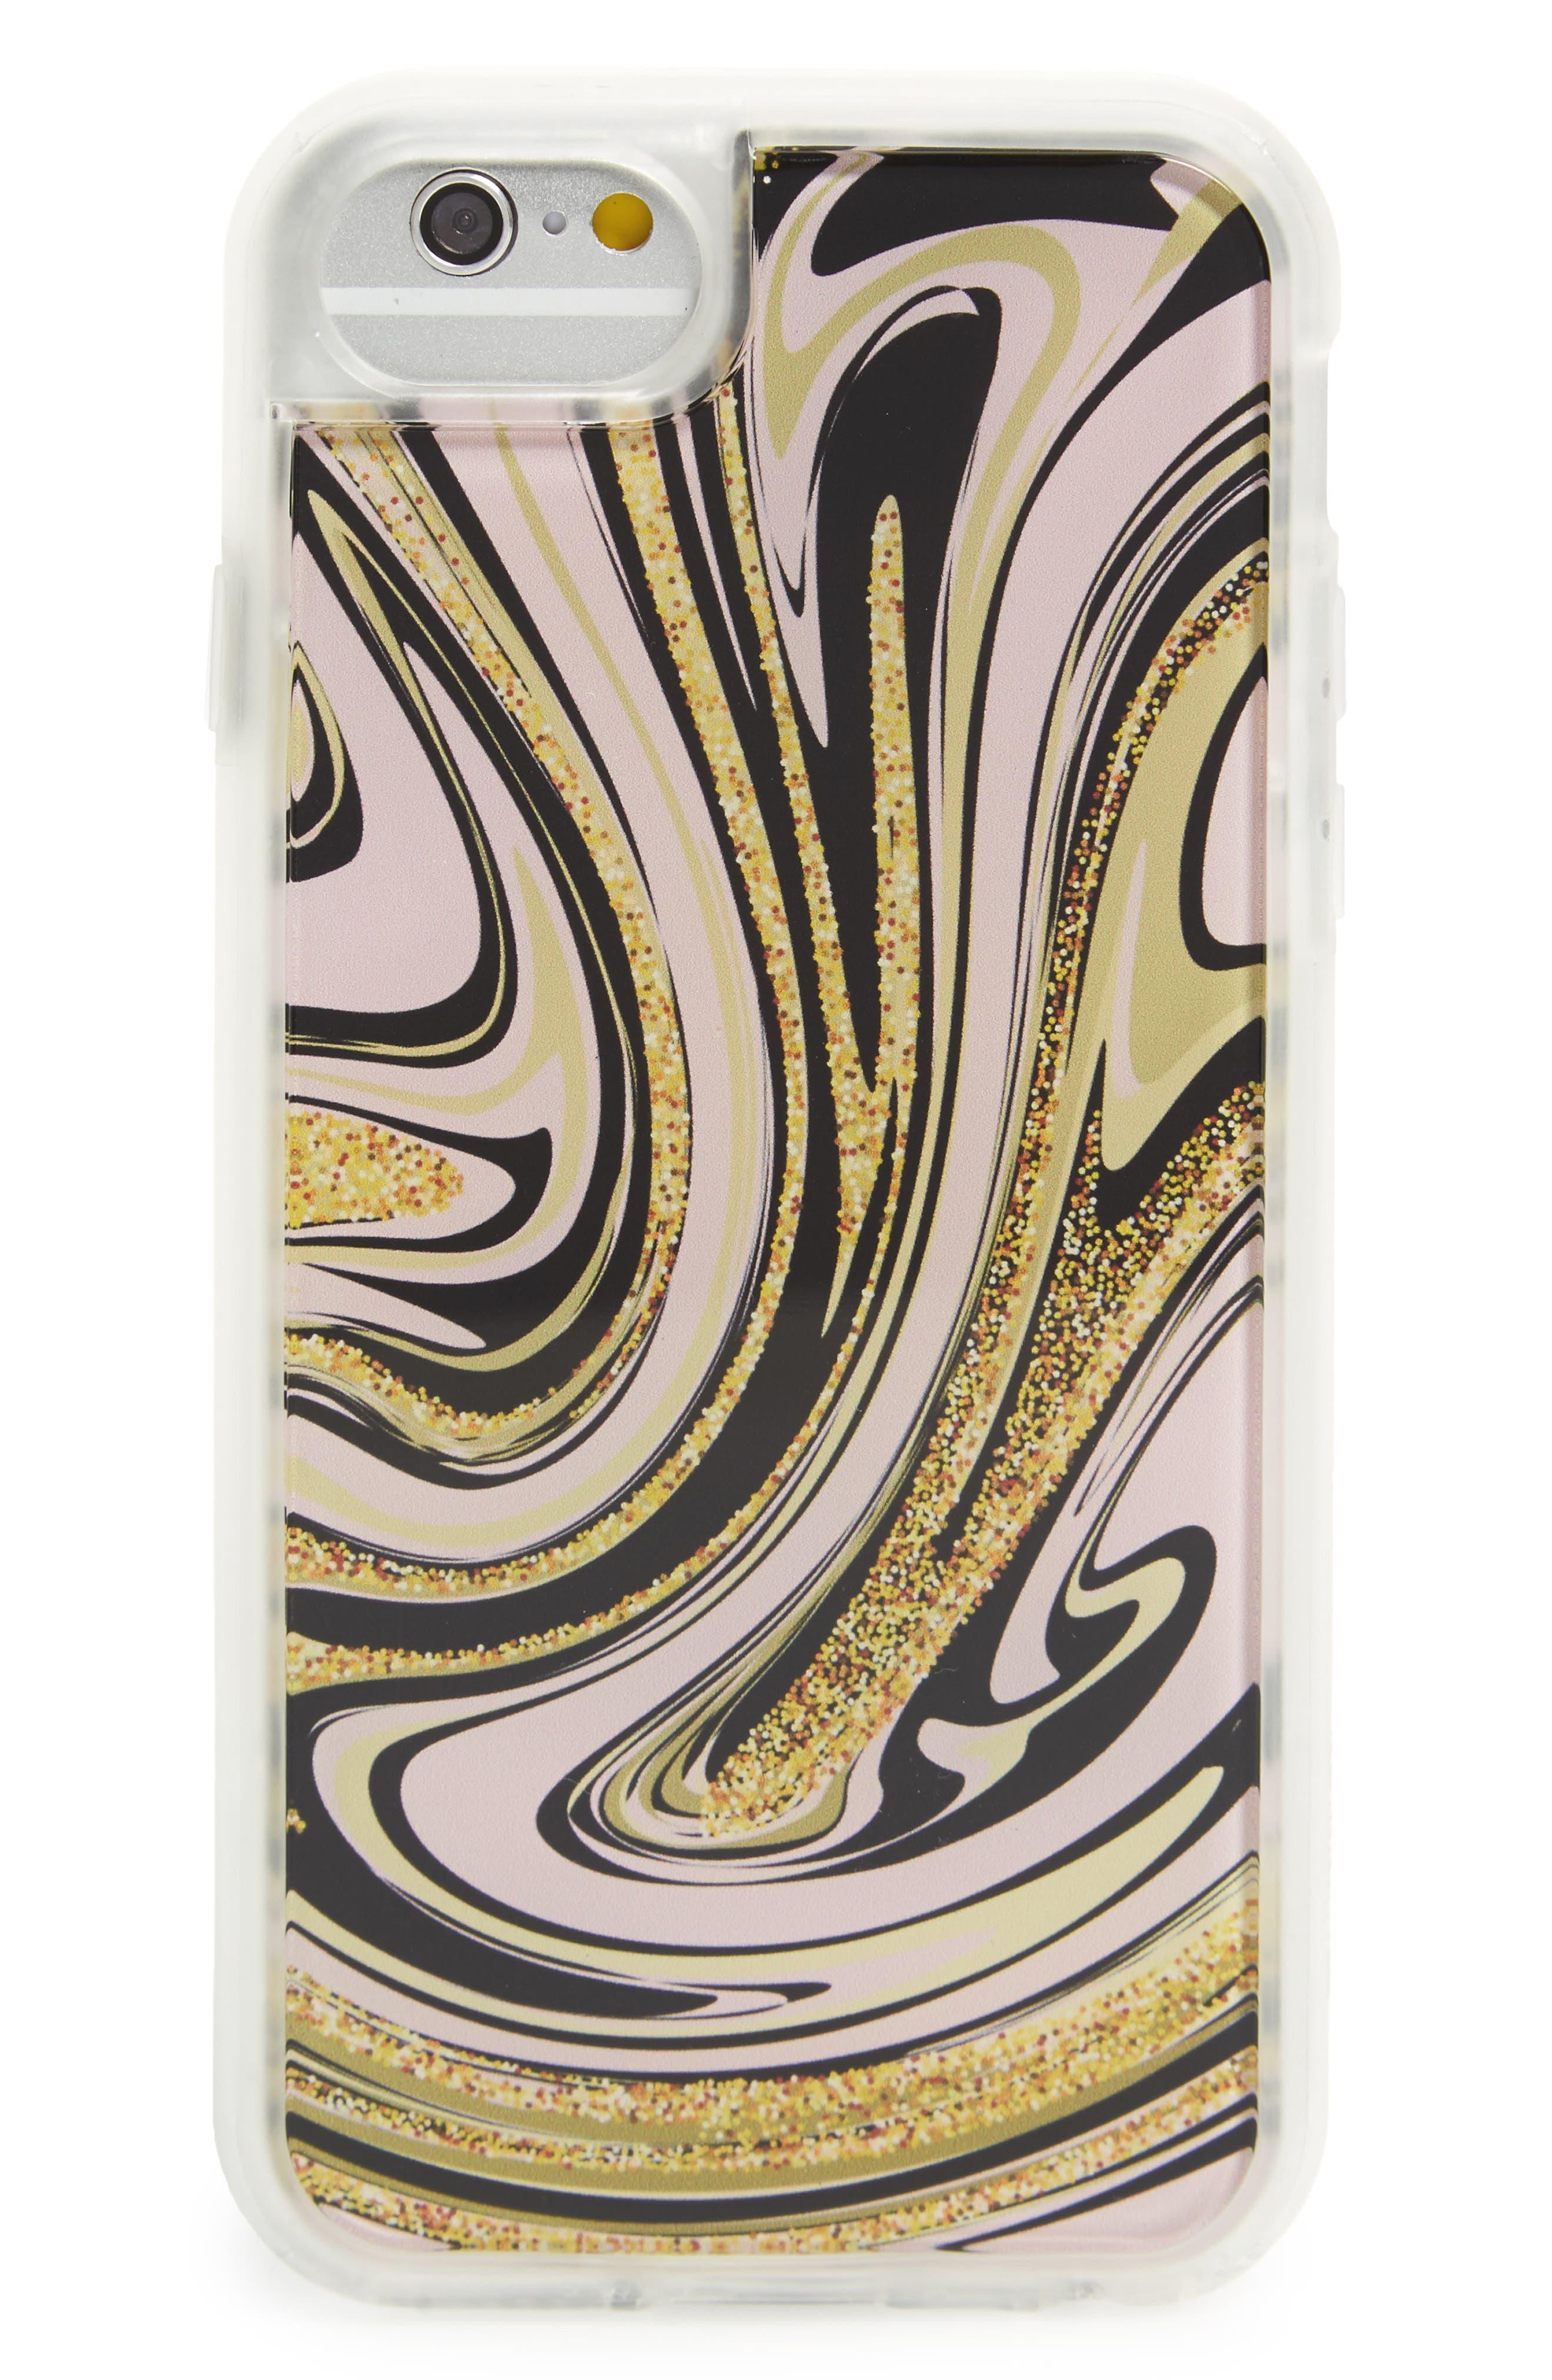 MILKYWAY Liquid Marble iPhone 6/6s/7 Case